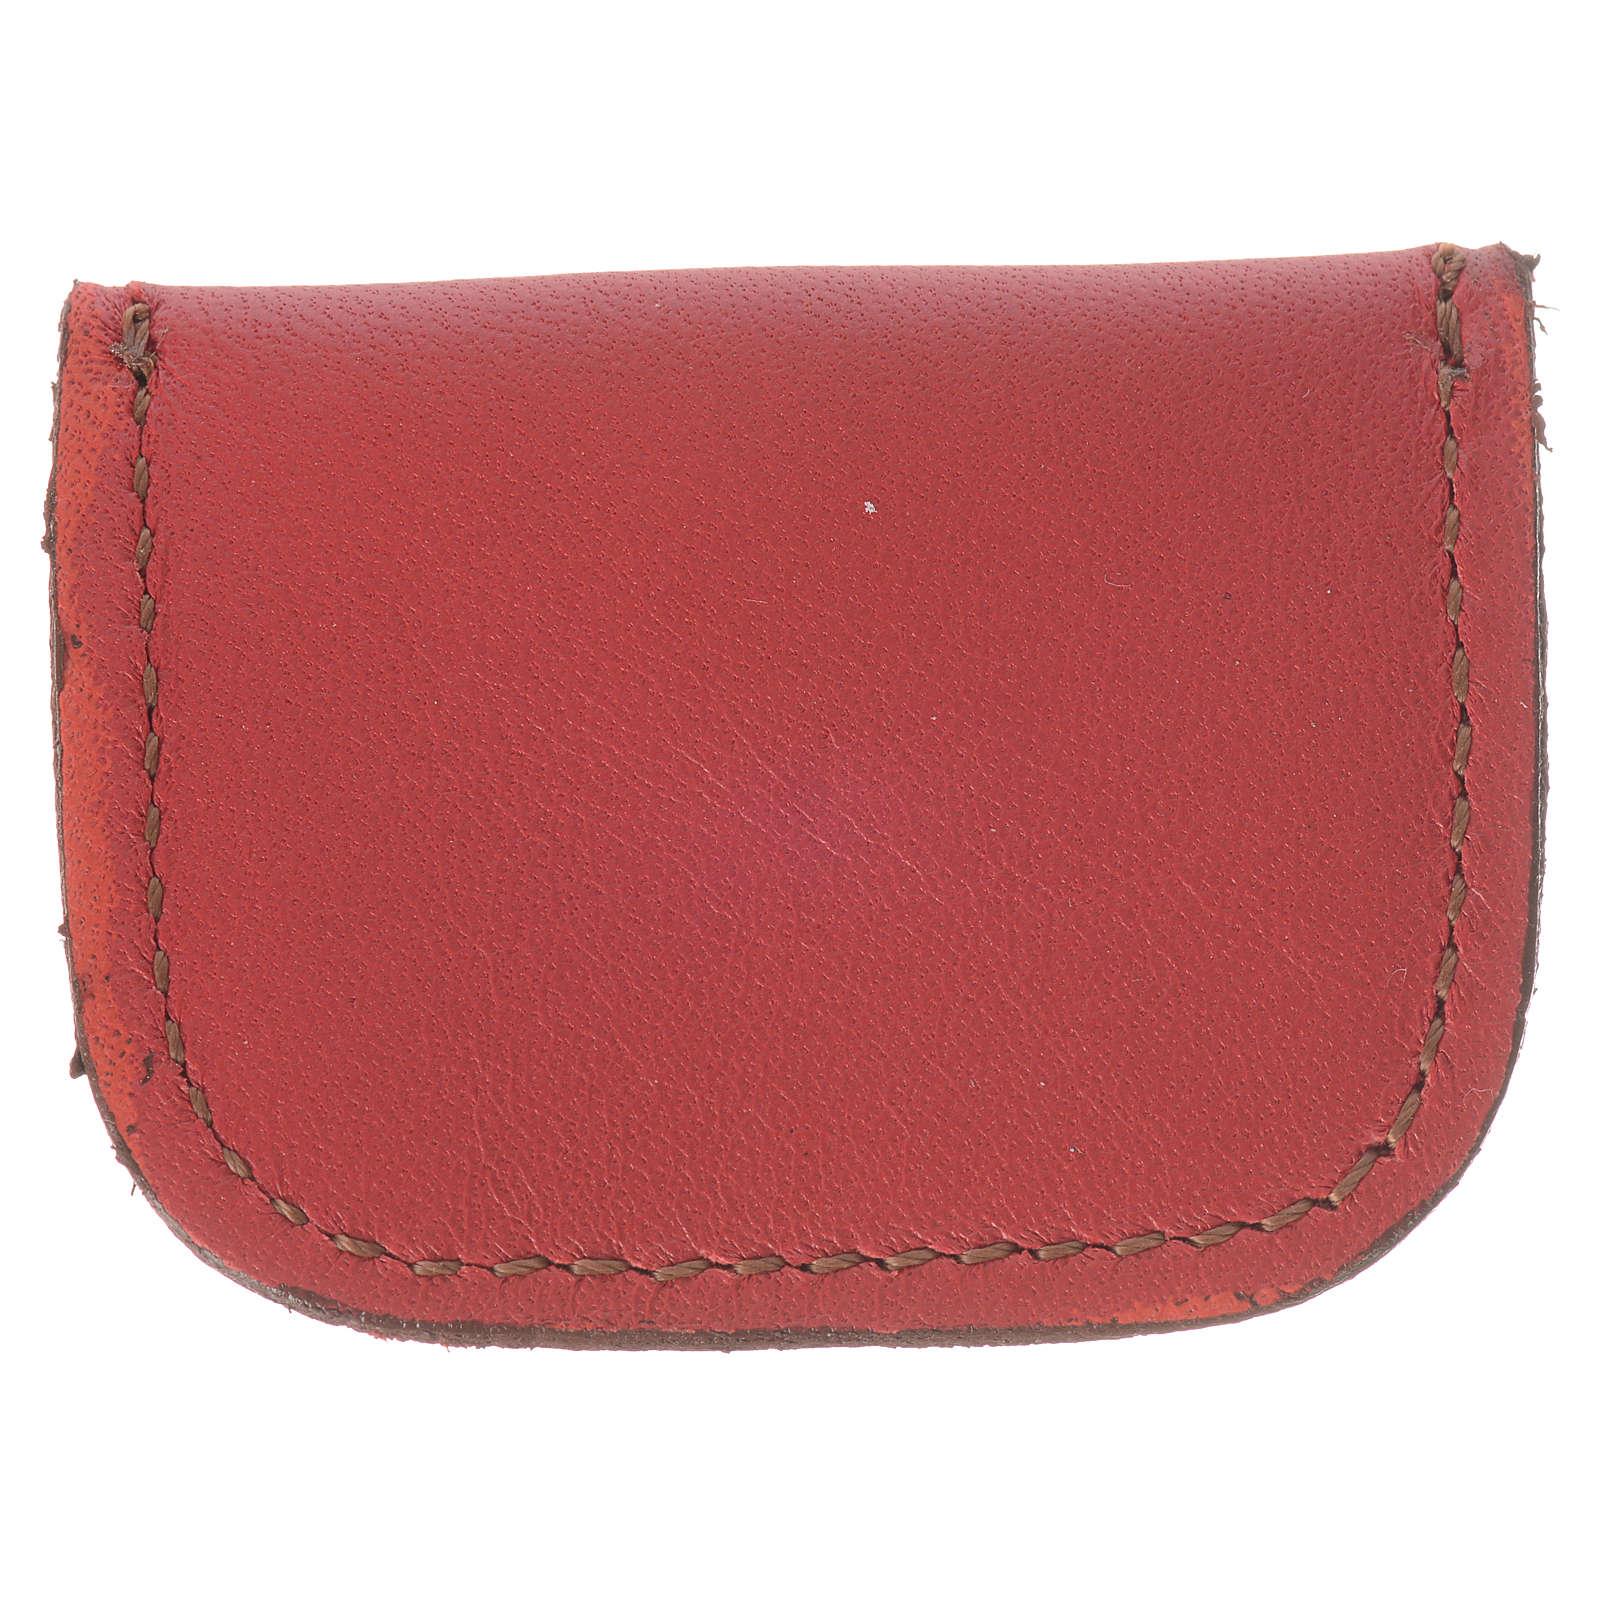 Portamedaglia pelle rossa Monaci di Bethlèem 4